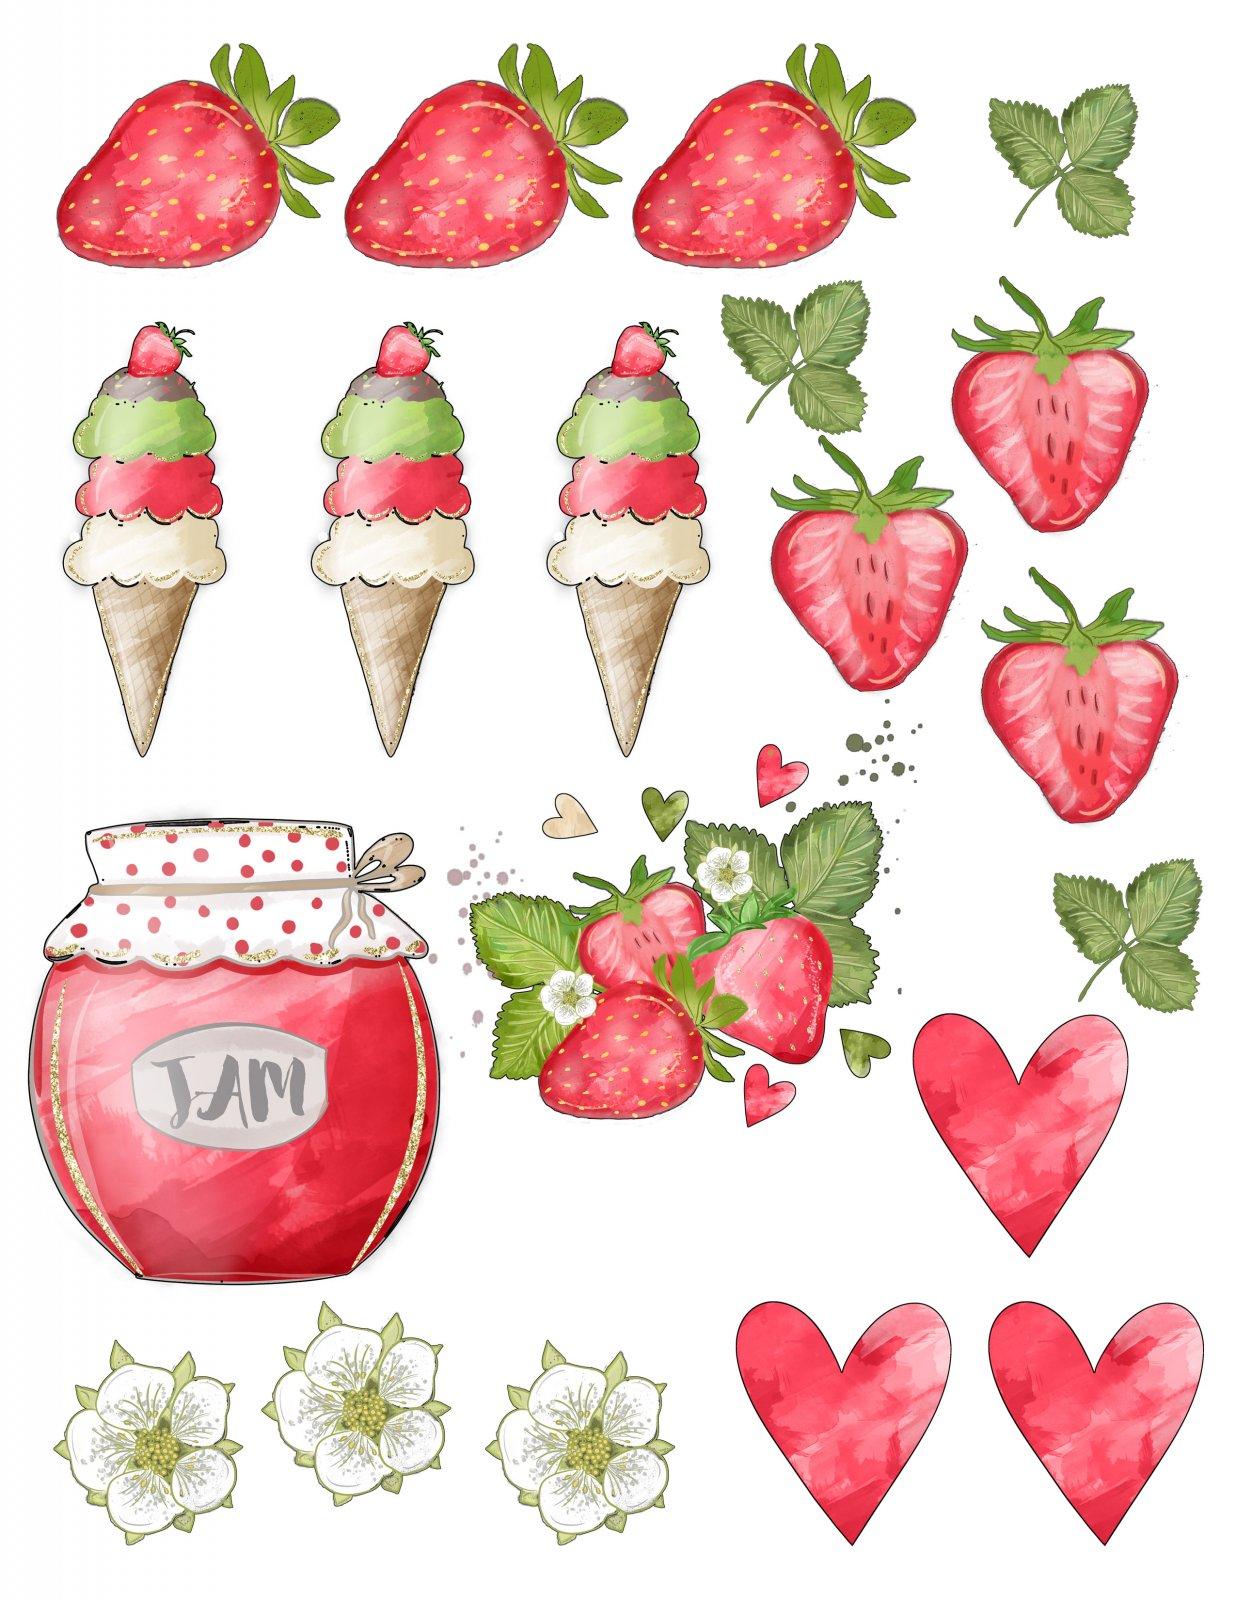 Scrapping for Less Ephemera Strawberry Fields